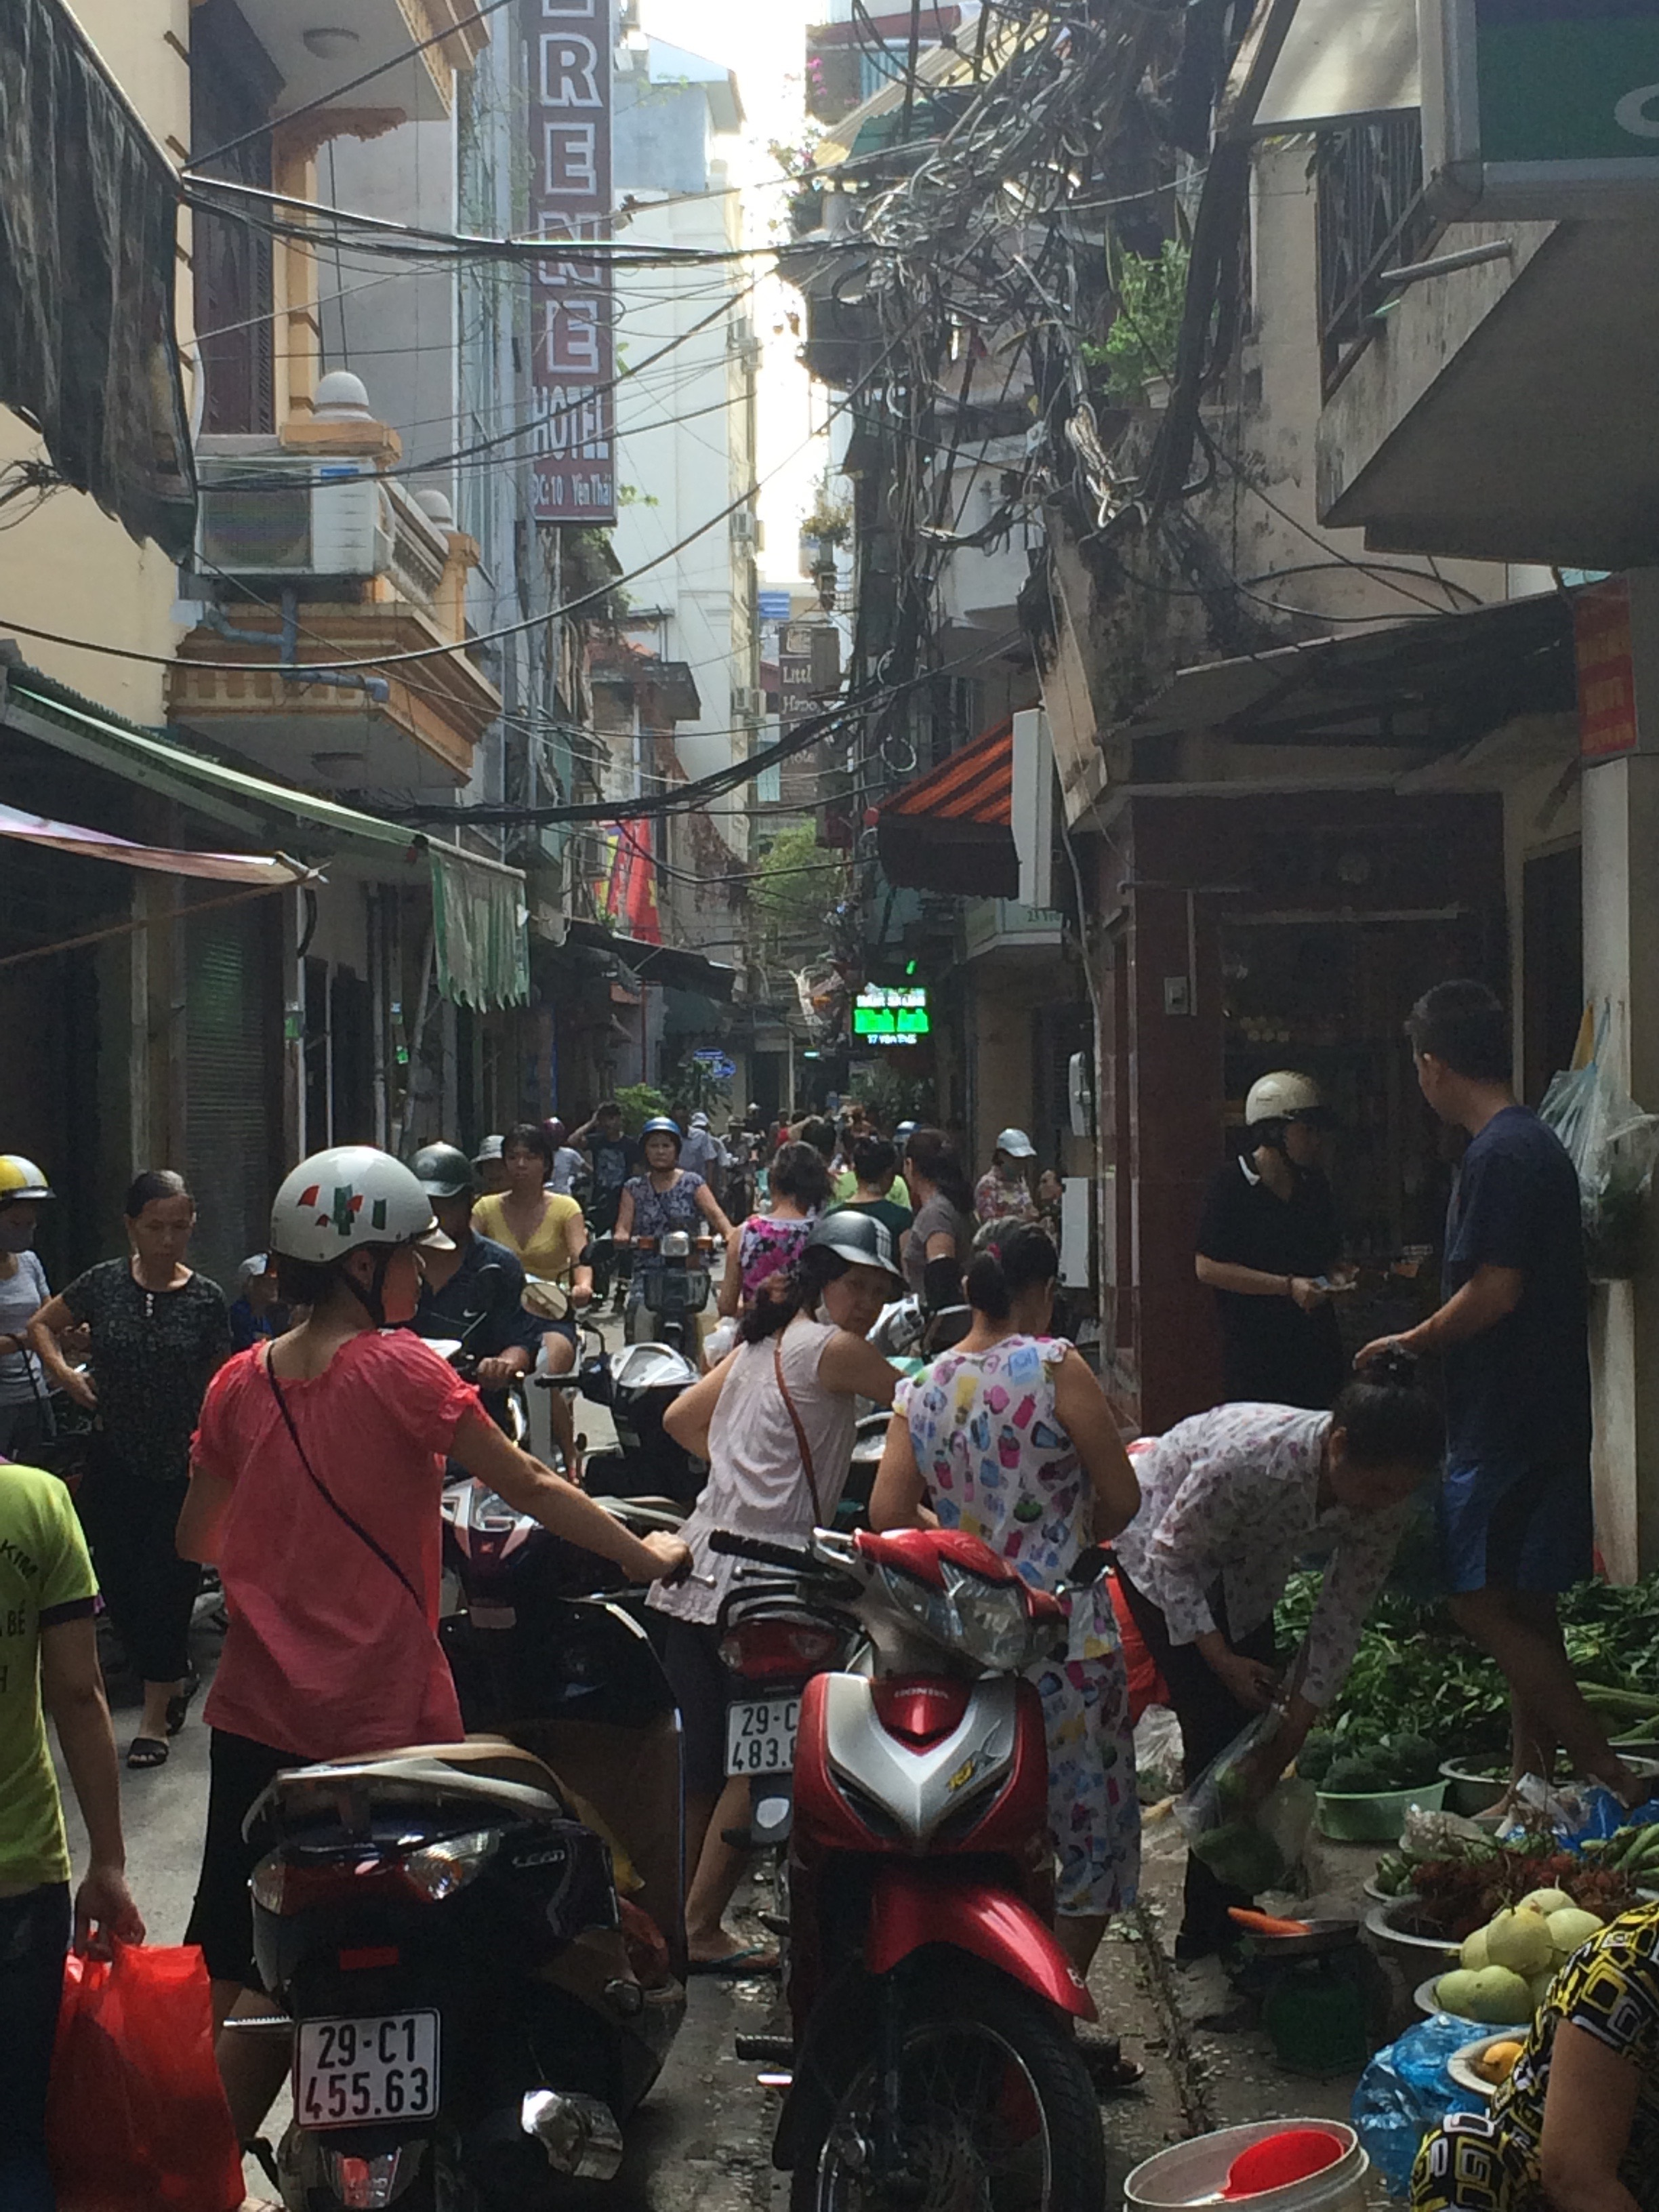 Market alley in Hanoi